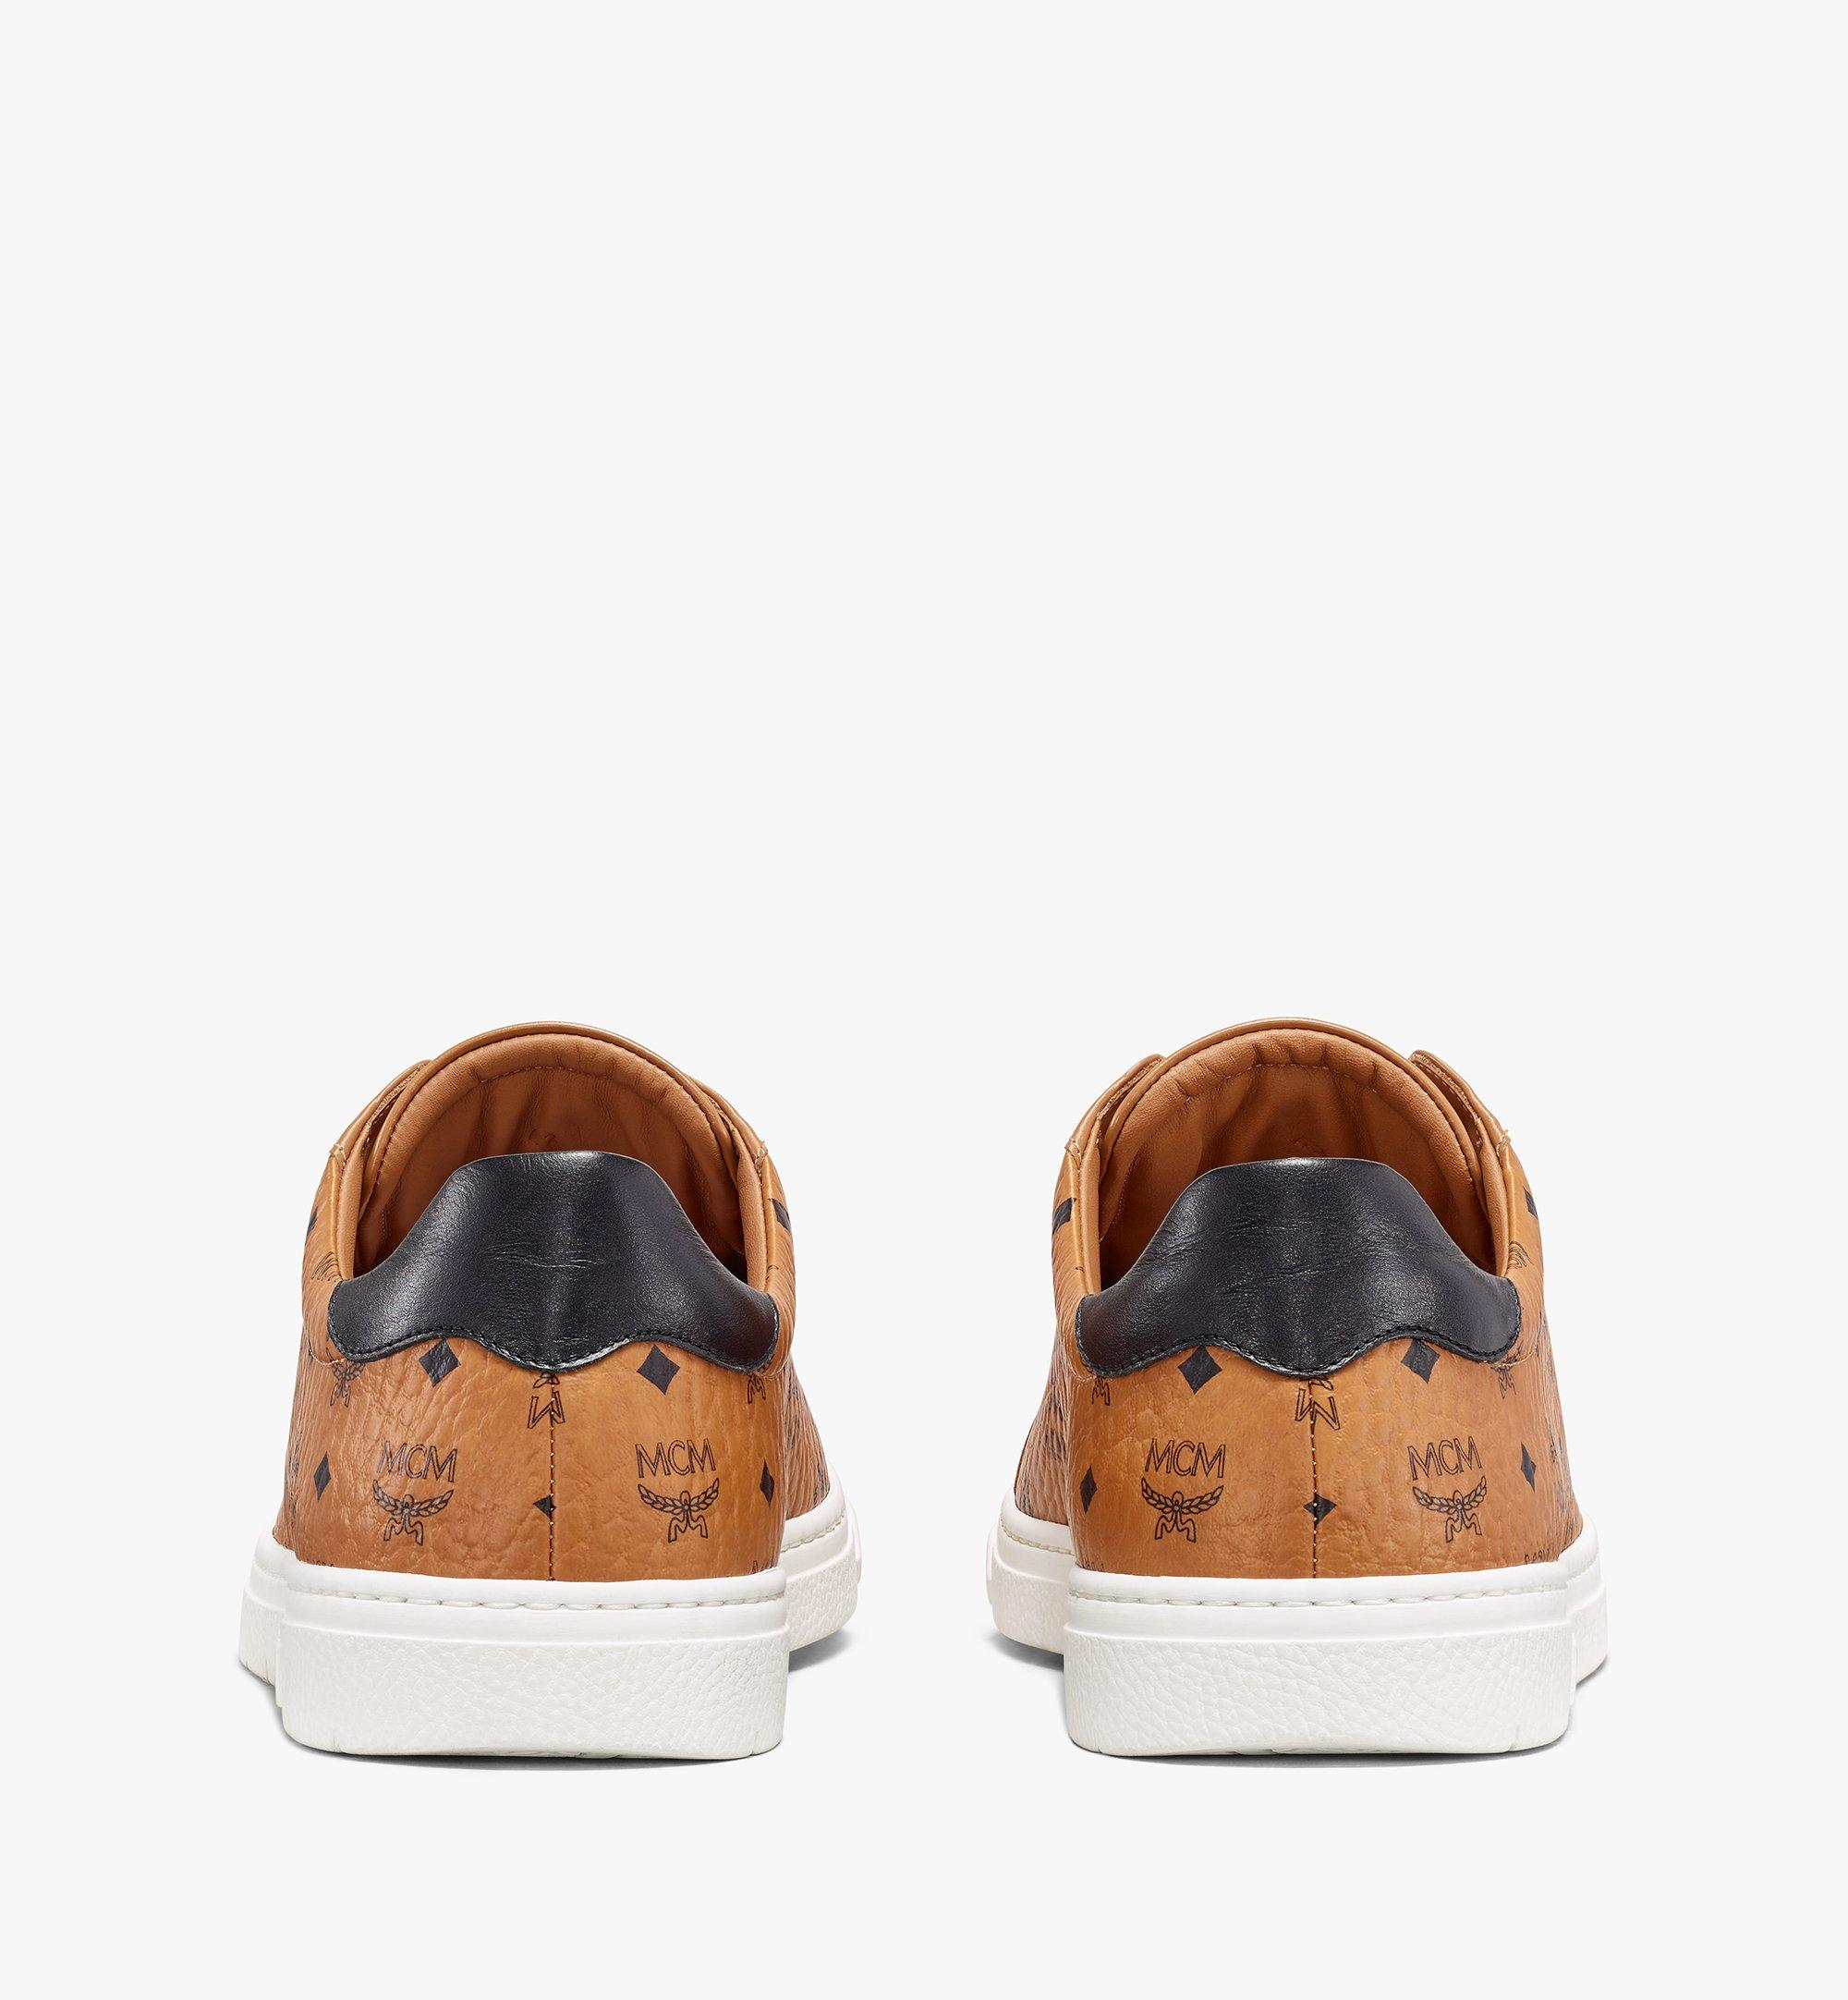 MCM Men's Terrain Lo Sneakers in Visetos Cognac MEXAAMM11CO042 มุมมองอื่น 2